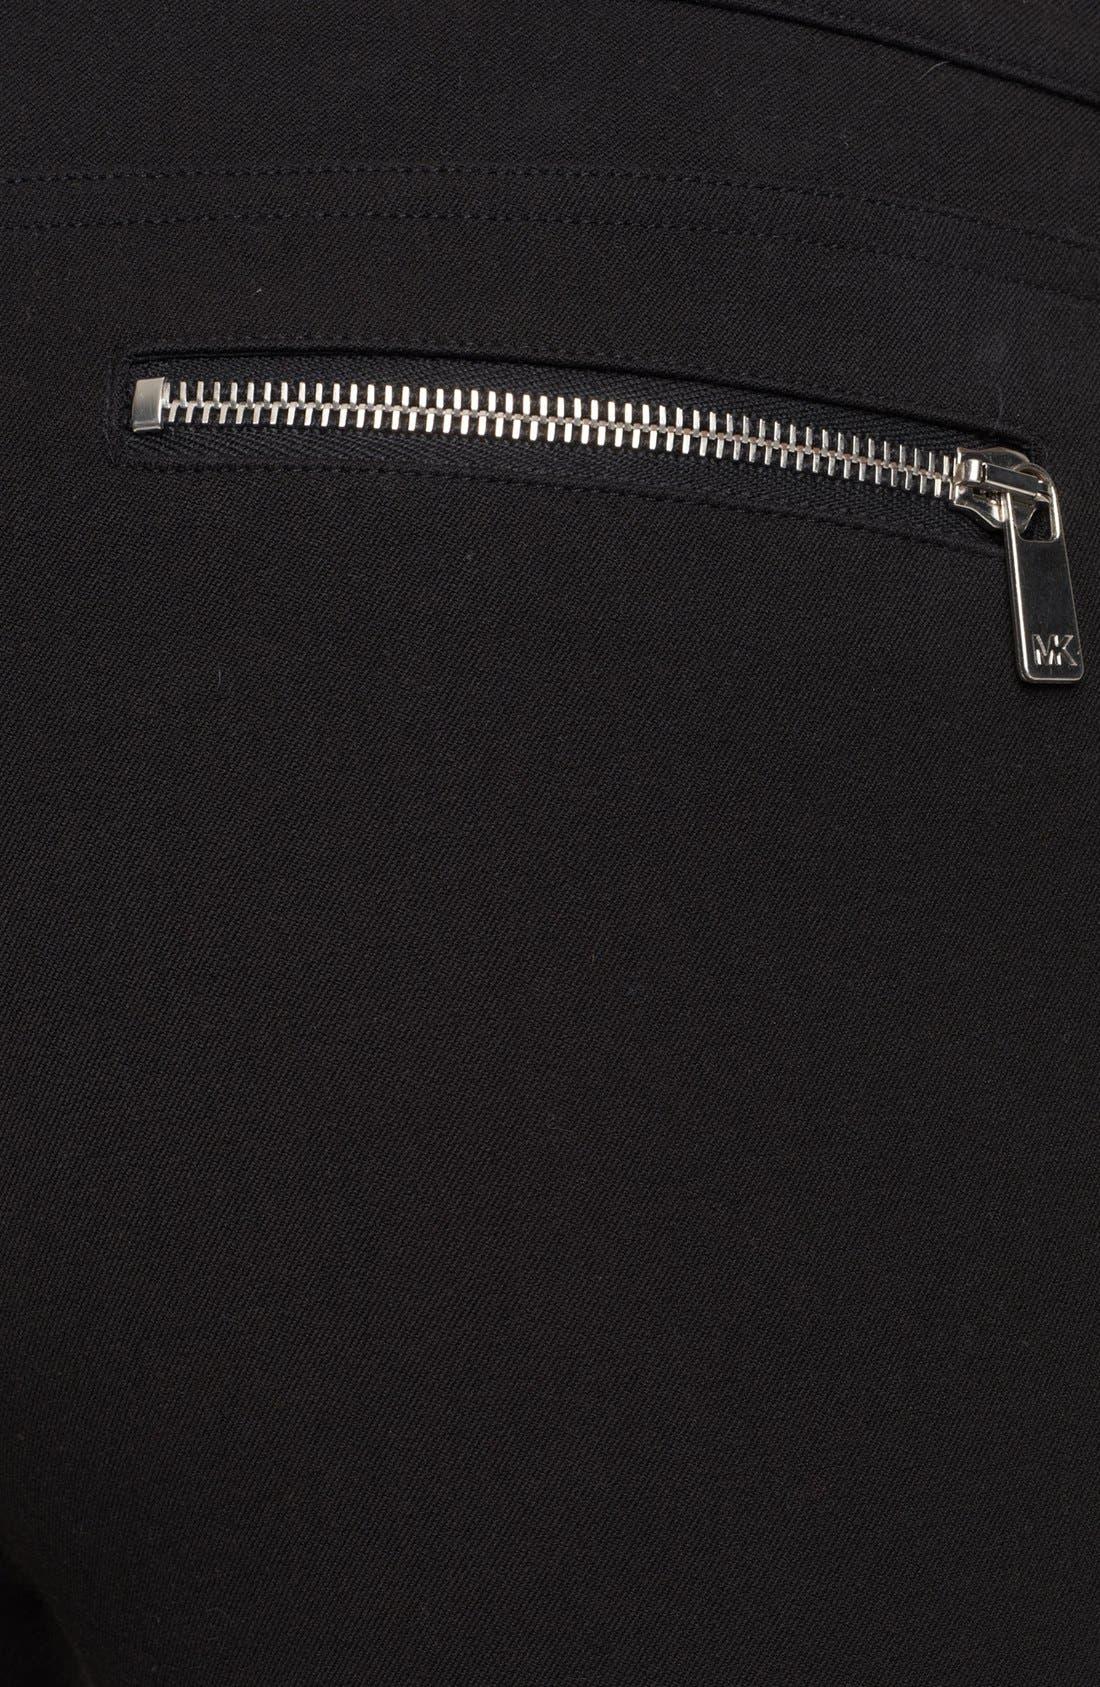 Alternate Image 3  - Michael Kors Skinny Jeans